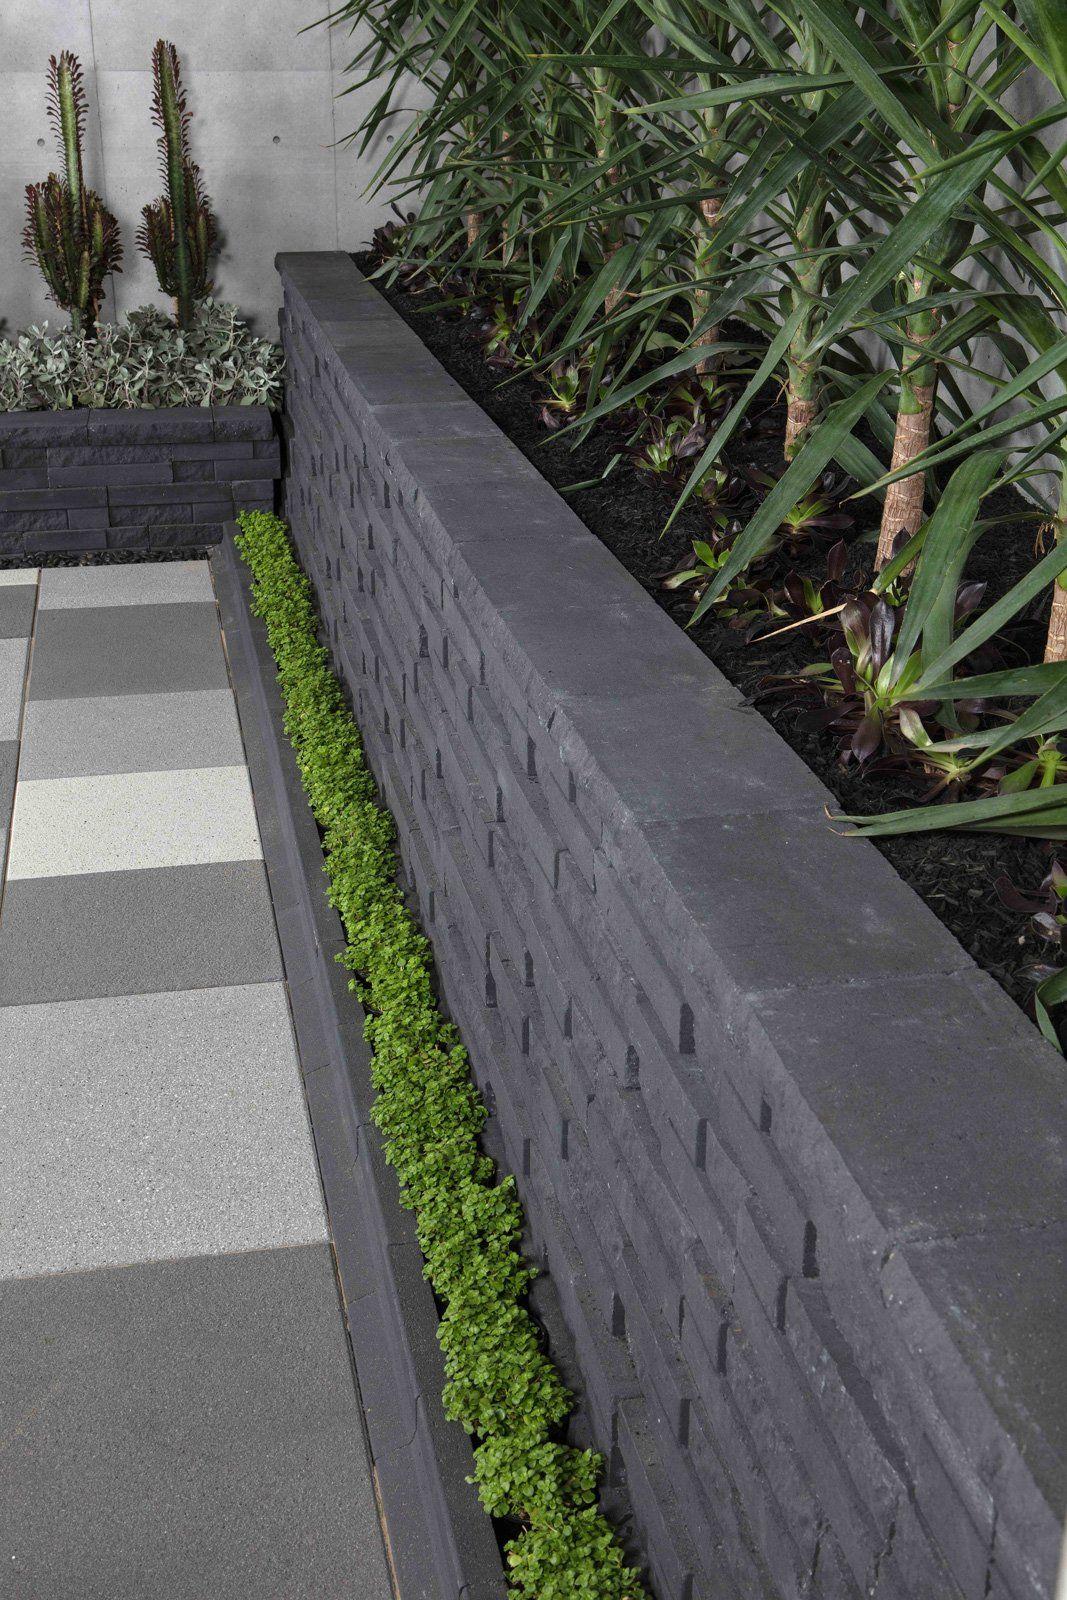 Natural Impressions Duostone Retaining Wall Bluestone Jpg 1067 1600 Garden Edging Garden Wall Garden Steps